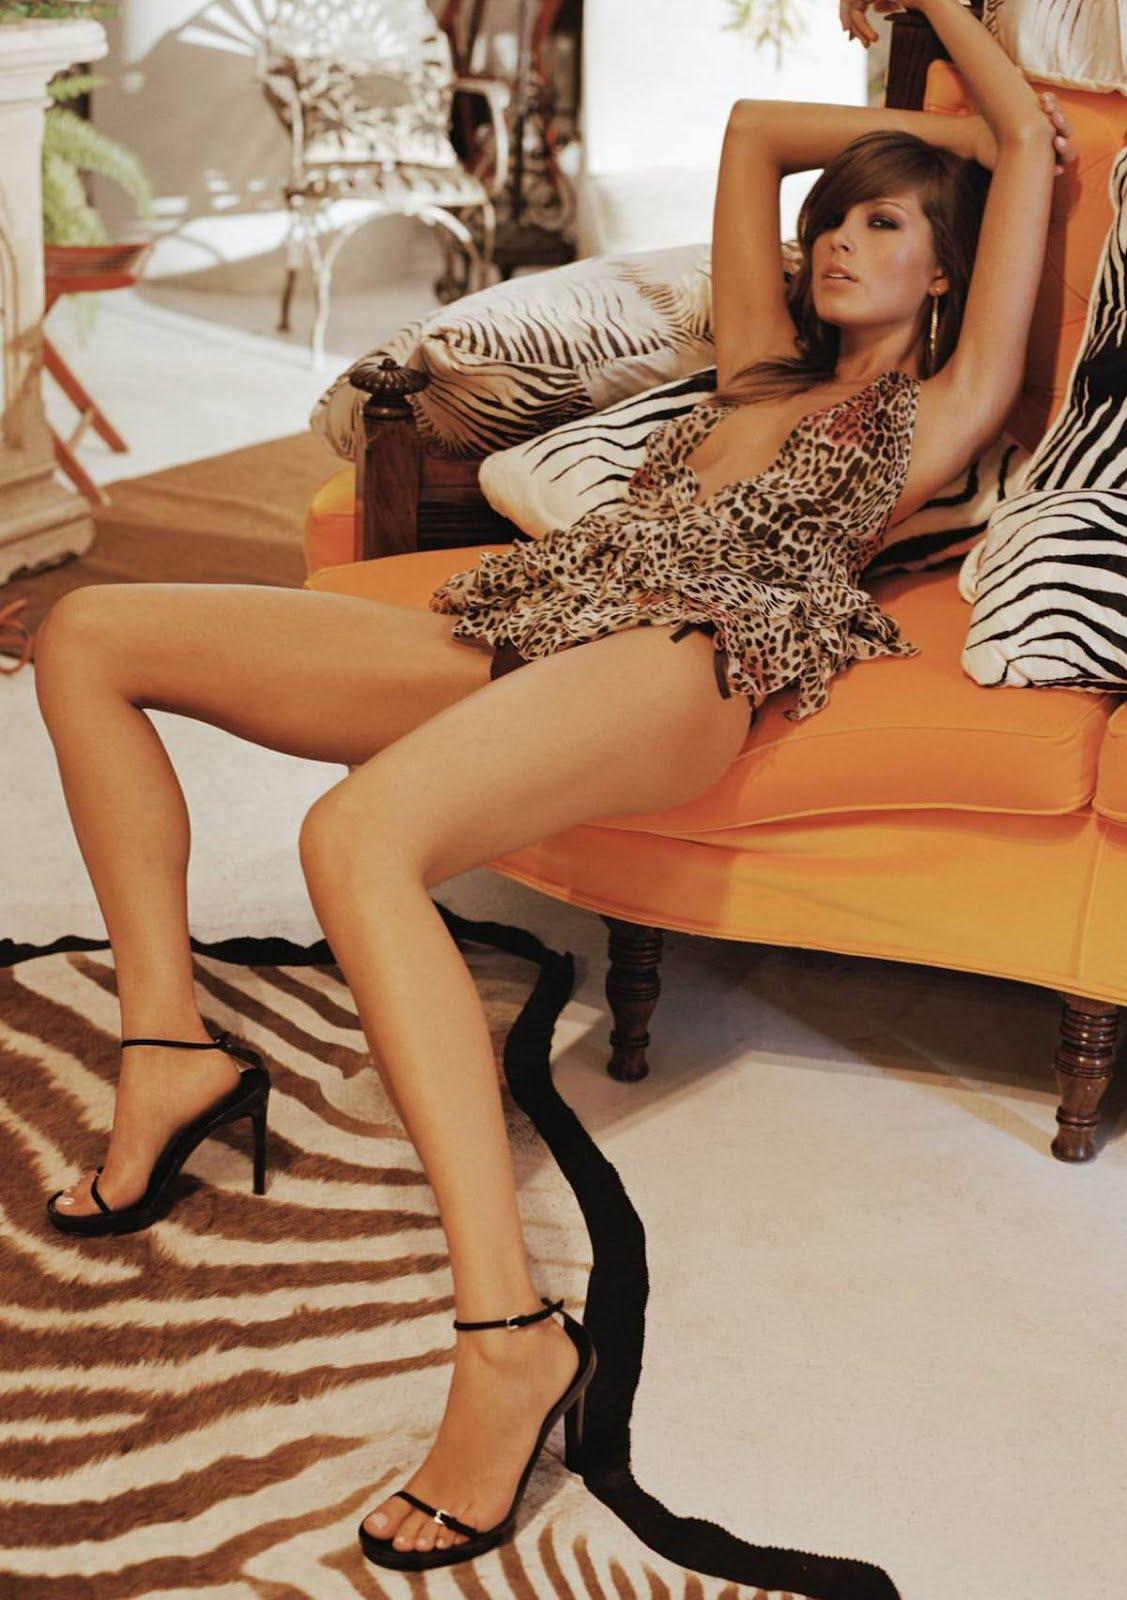 Feet Panties Penny Meredith  nude (47 images), 2019, in bikini